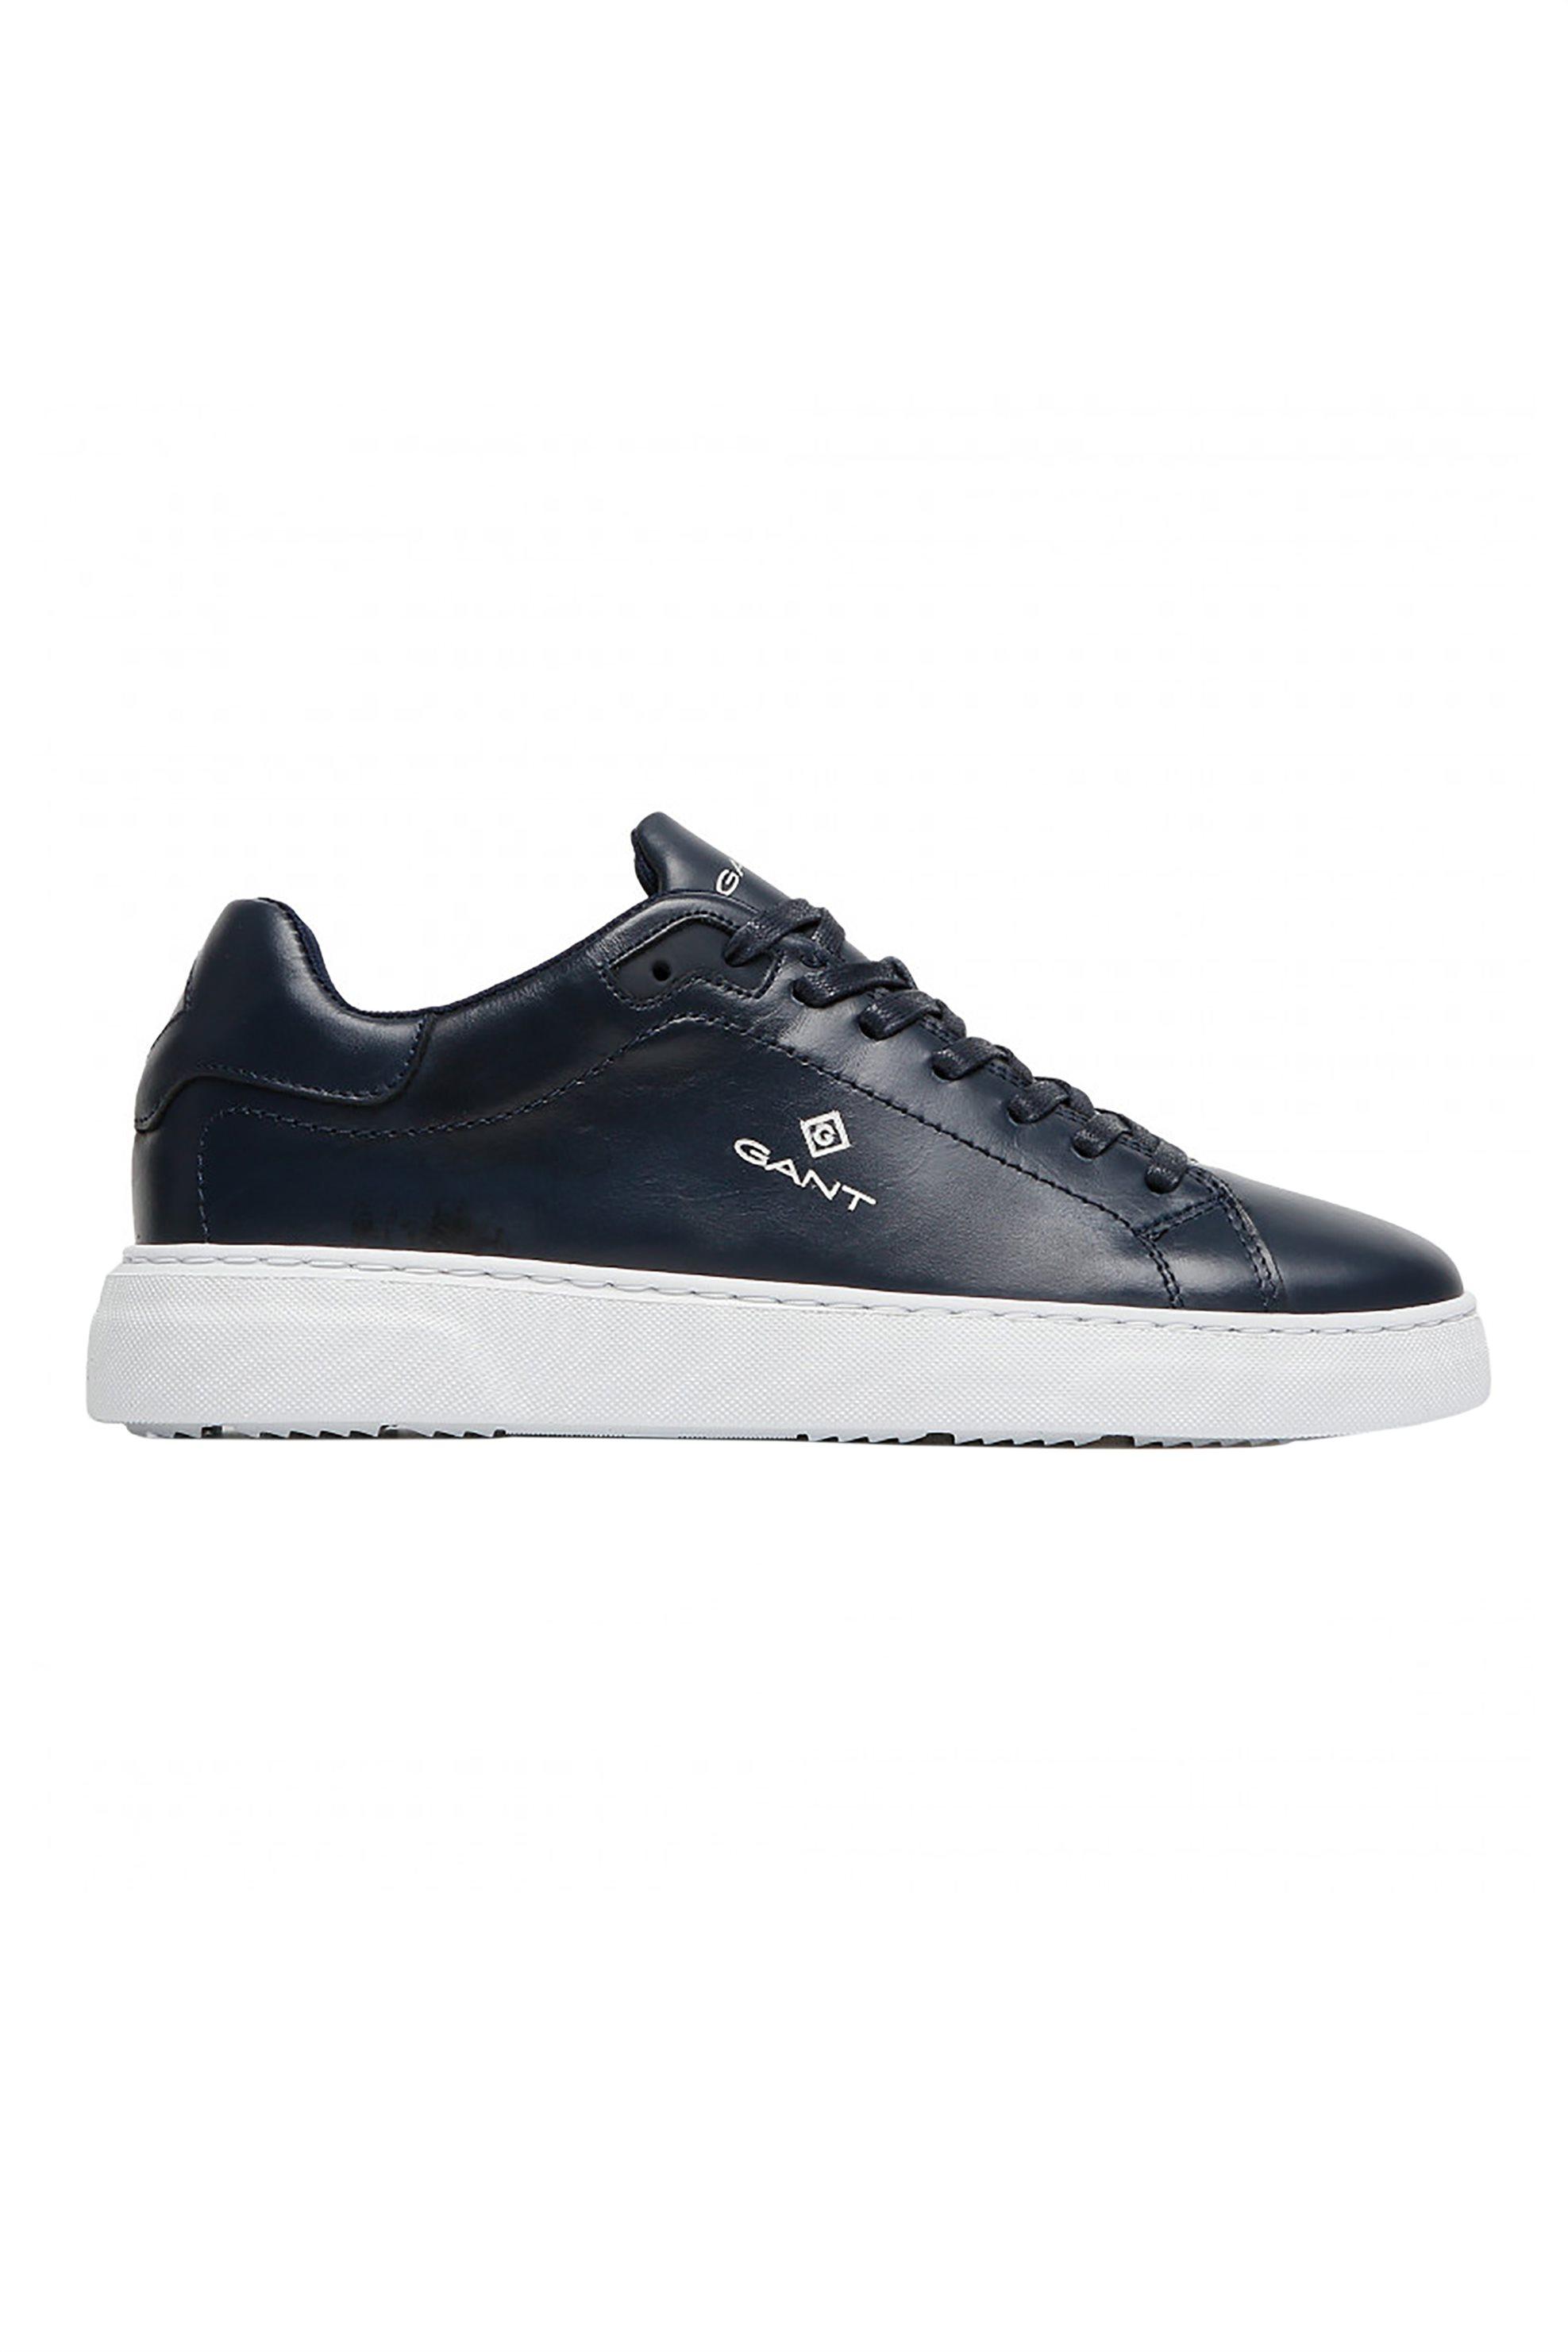 "Gant ανδρικά sneakers με logo print στο πλάι ""Joree"" – 22631645 – Μπλε Σκούρο"